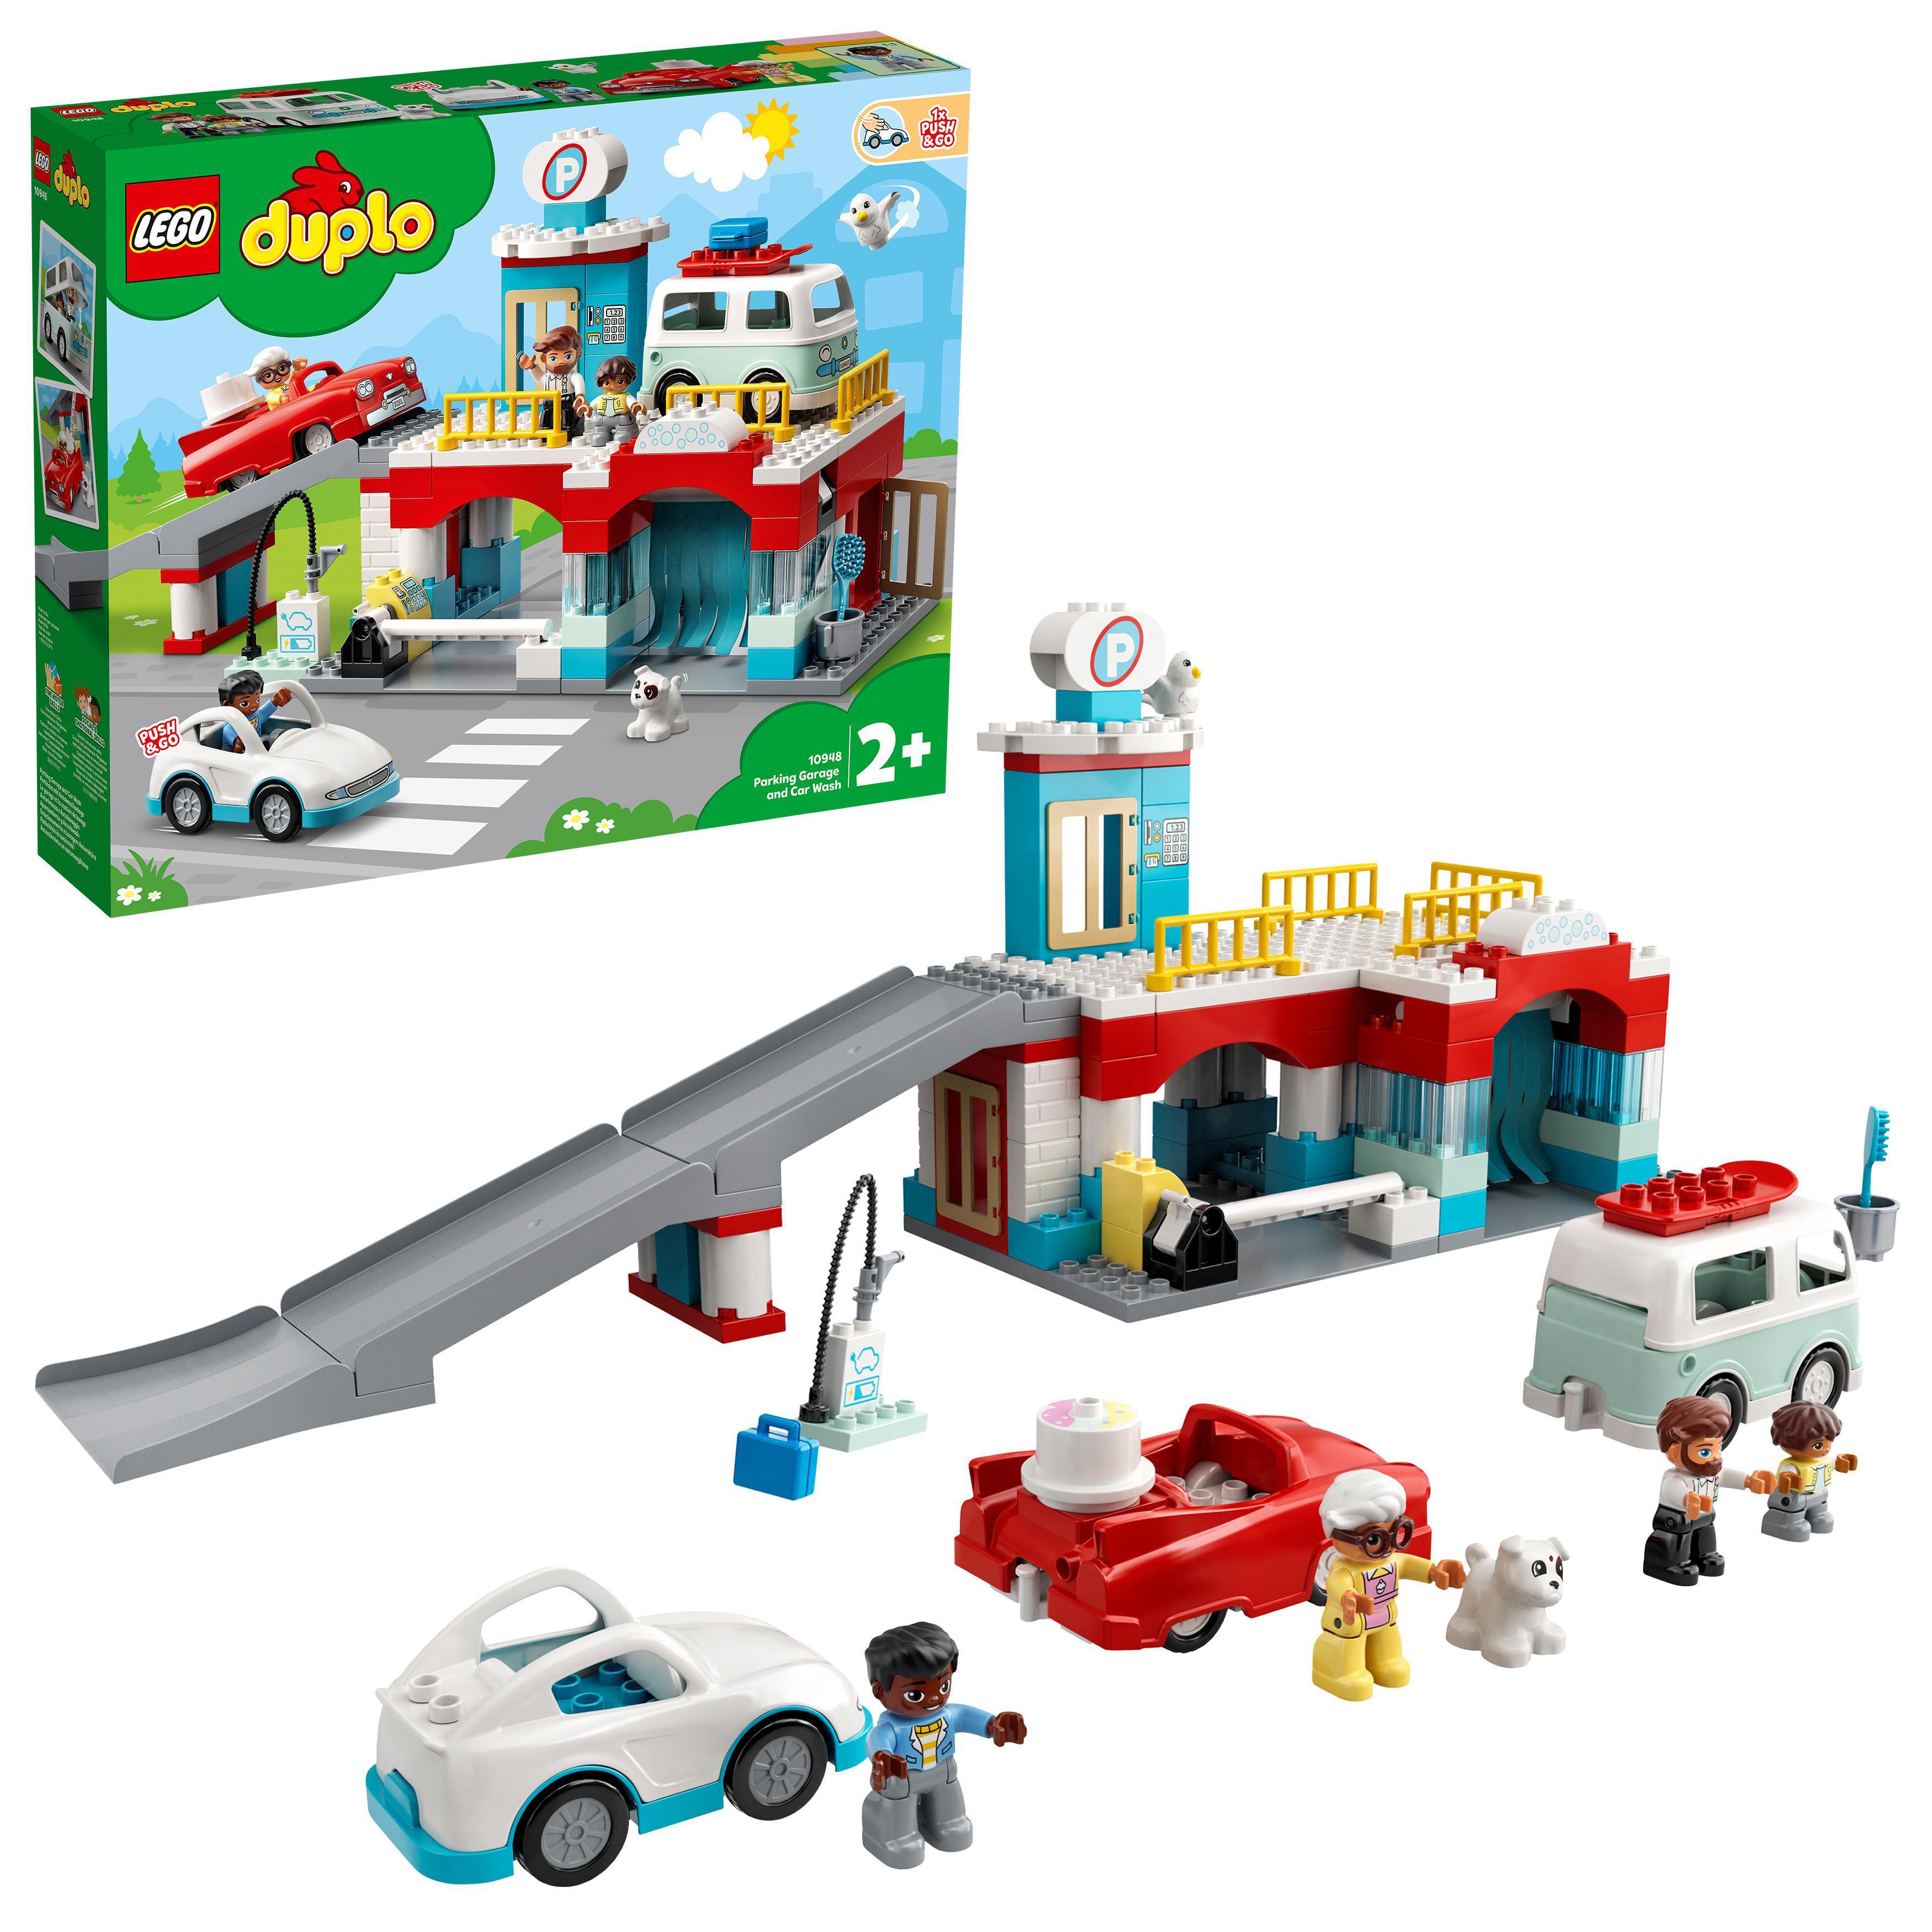 LEGO DUPLO - Parking Garage and Car Wash (10948)